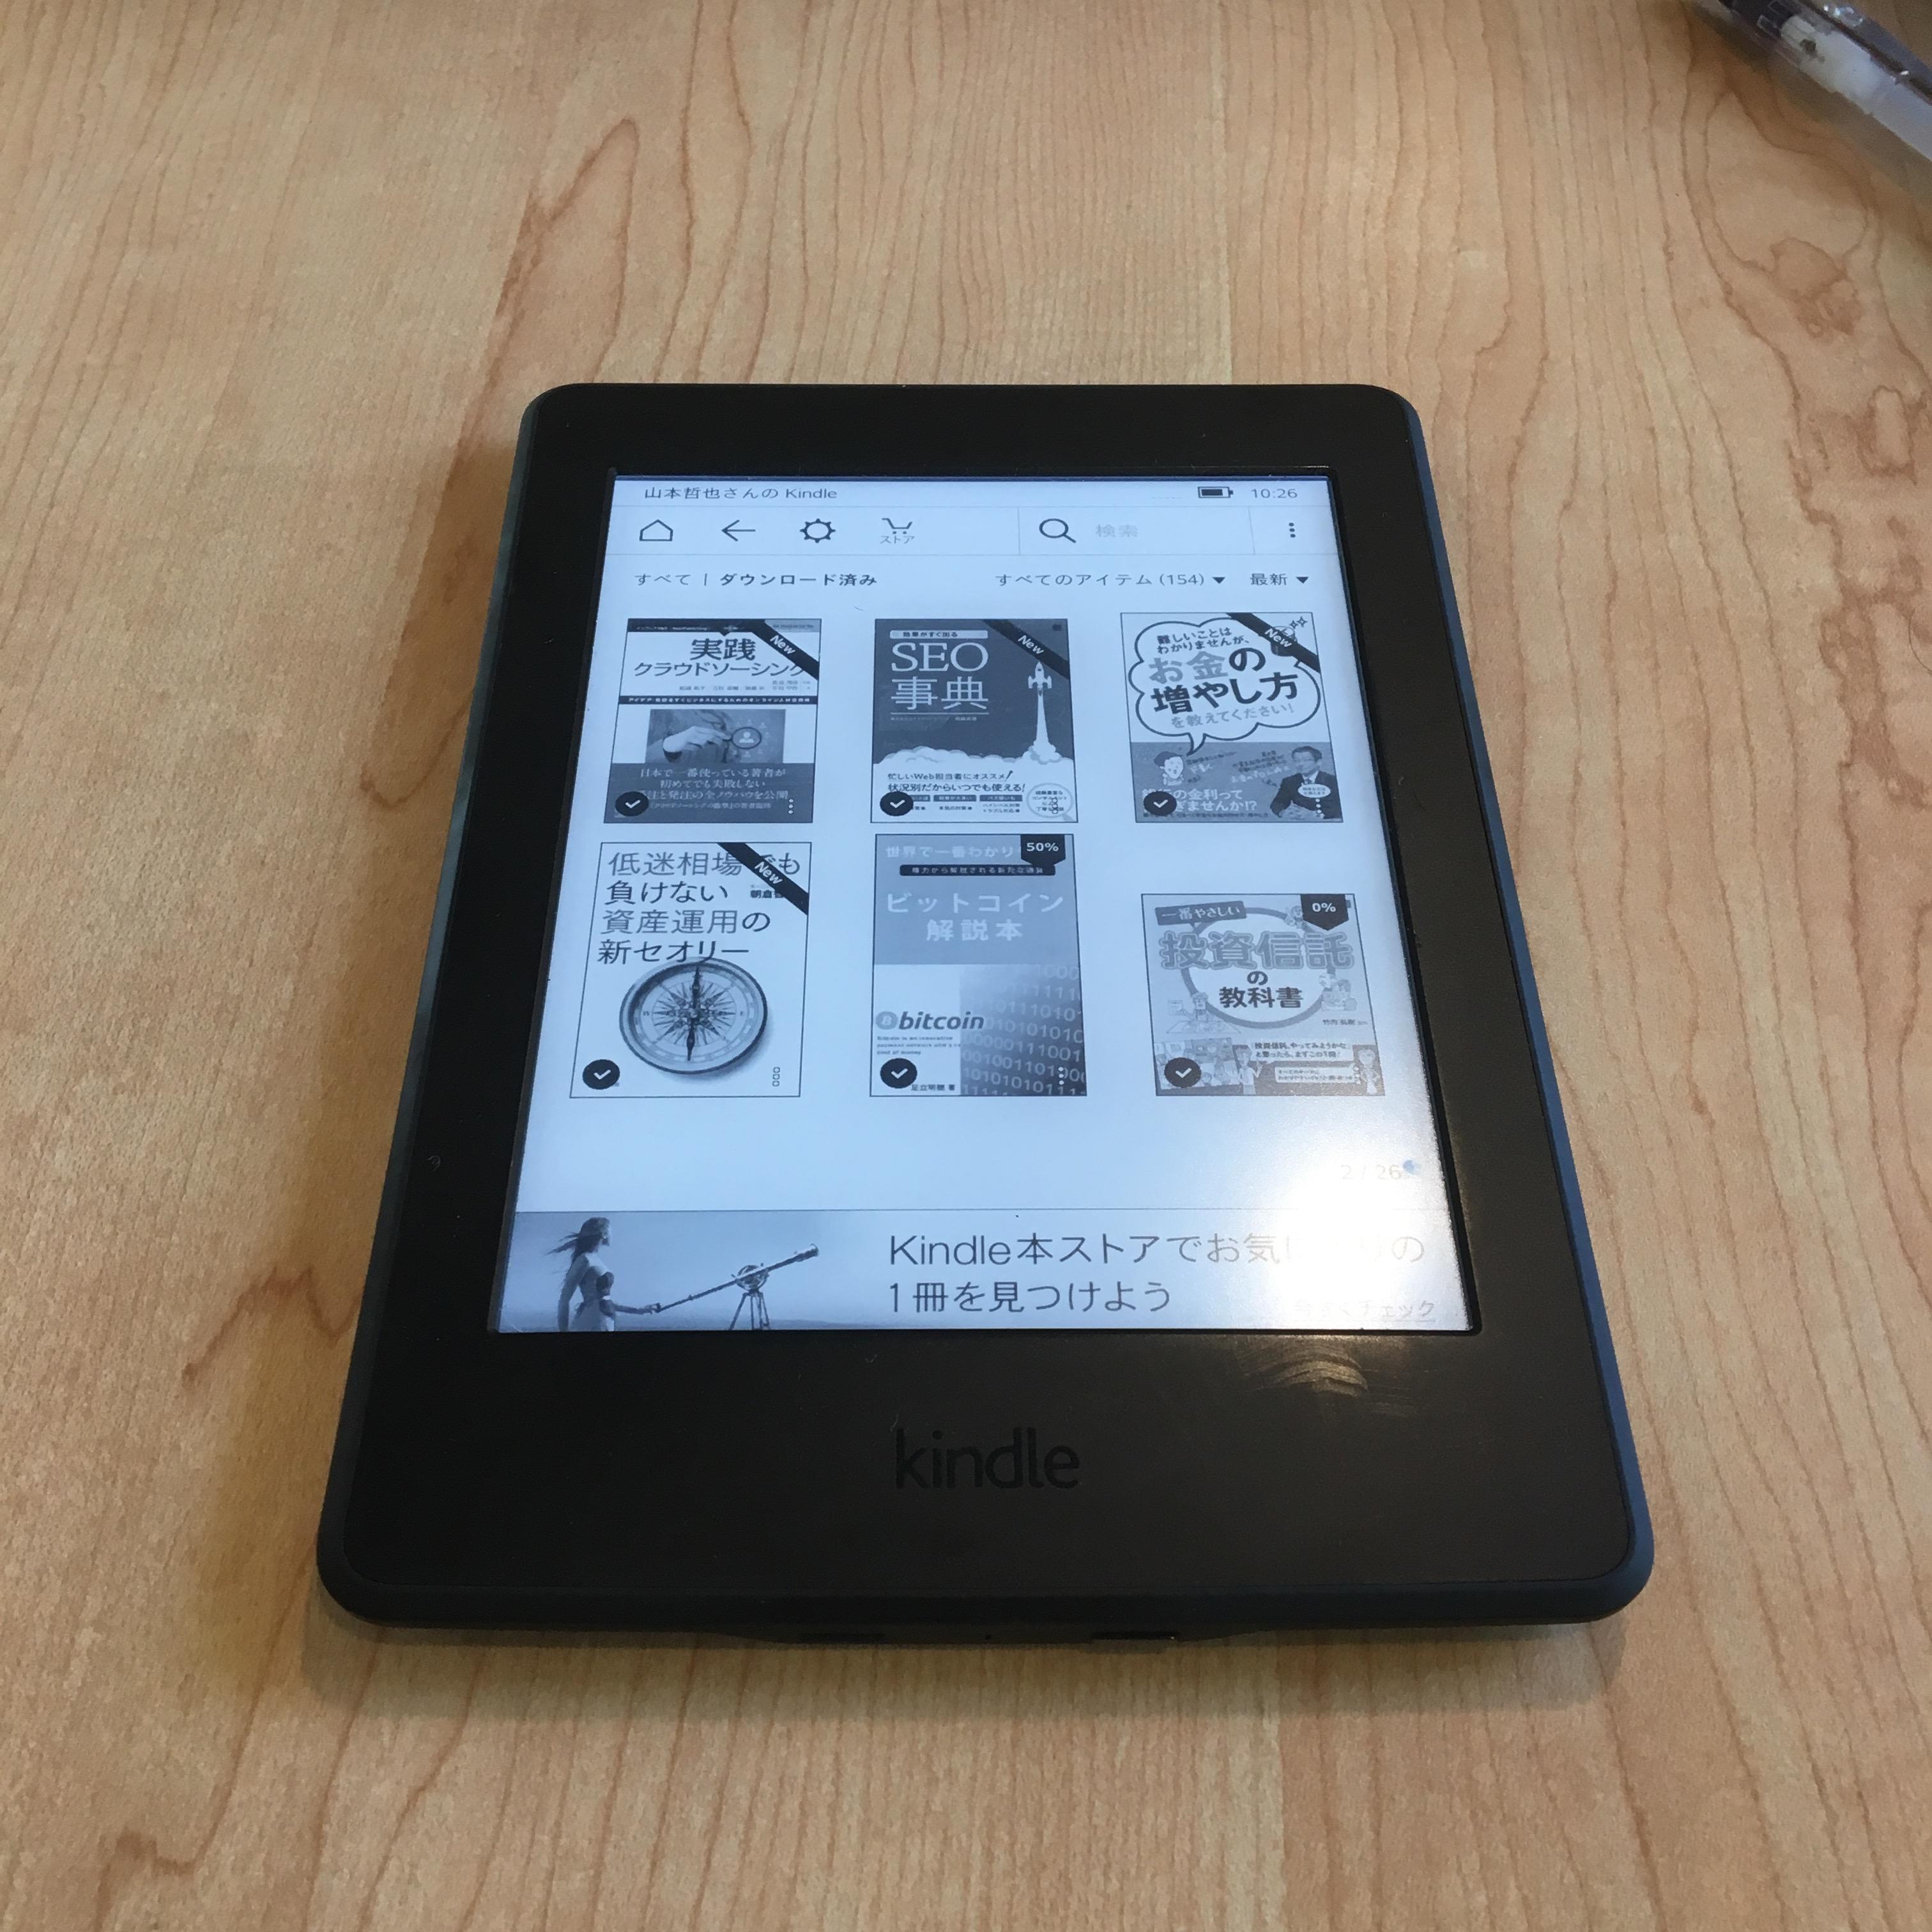 Kindle Paperwhite +kindle Unlimitedは海外長期滞在者にとって最強のアイデムとなる。